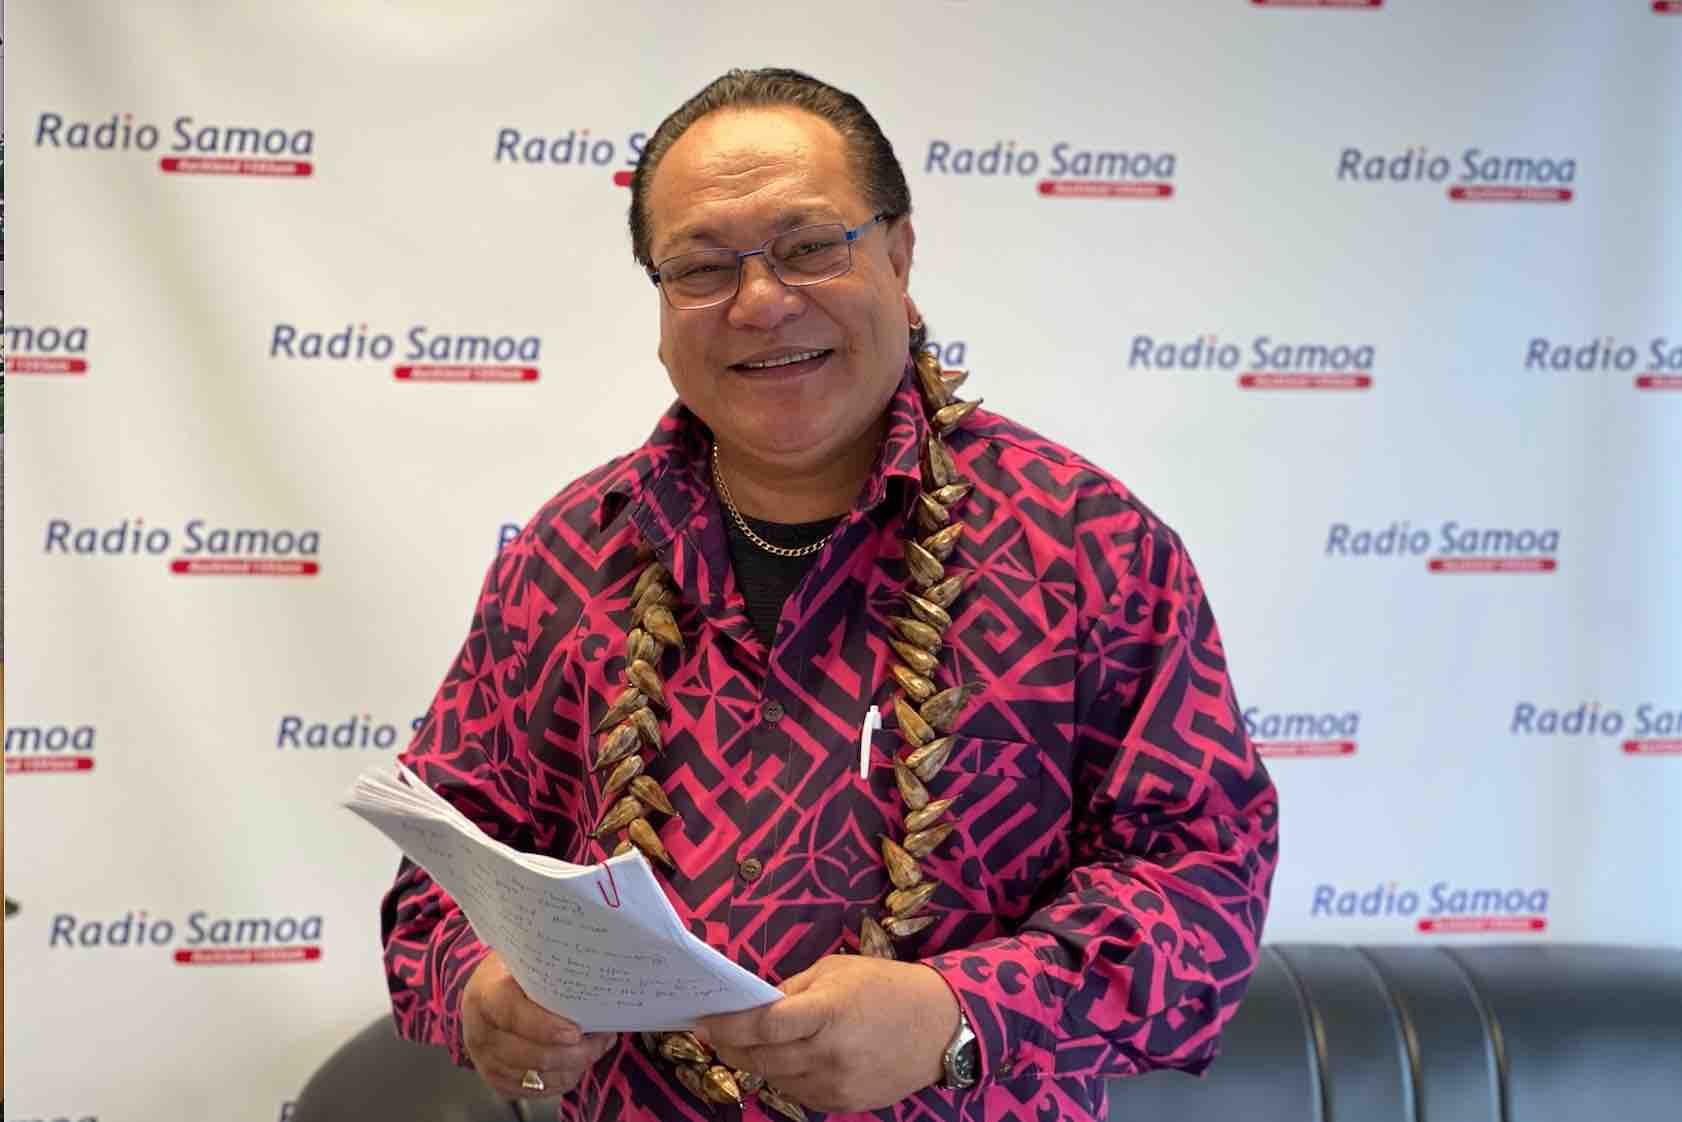 Samoa Radio Host Savea Al Harrington. Photo: John Pulu, Tagata Pasifika.